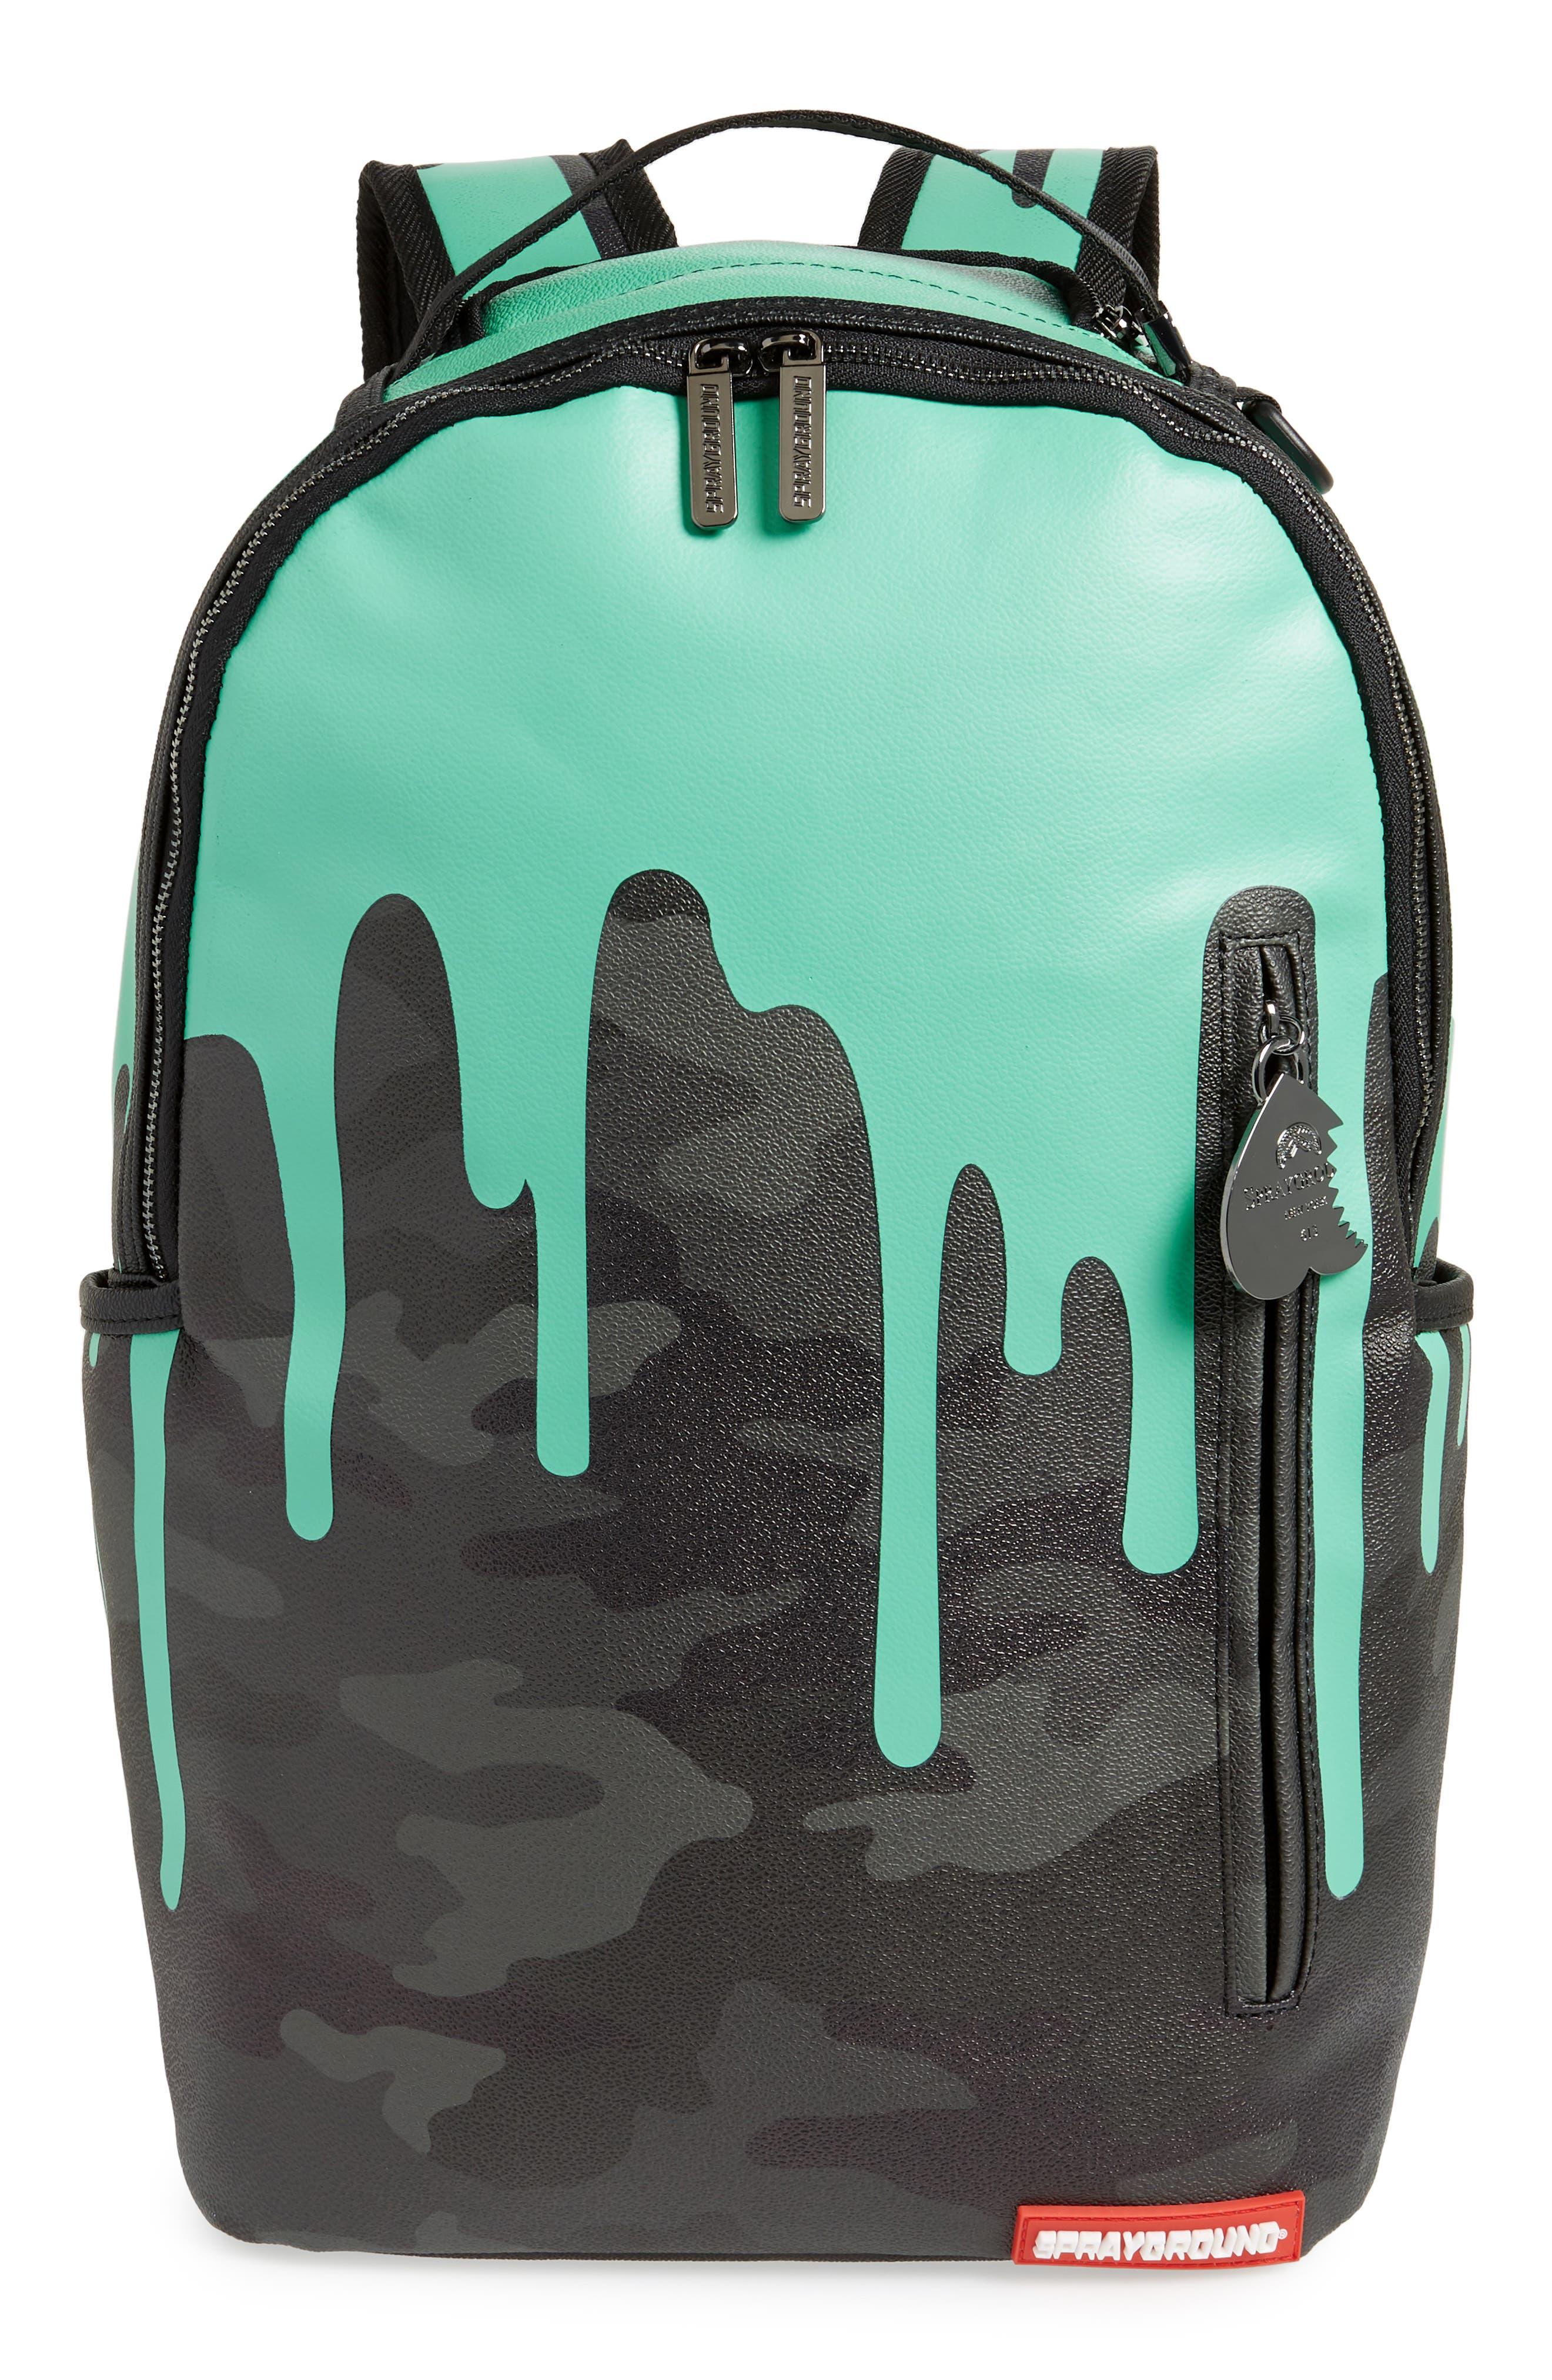 SPRAYGROUND,                             Tiff Drips Print Backpack,                             Main thumbnail 1, color,                             020